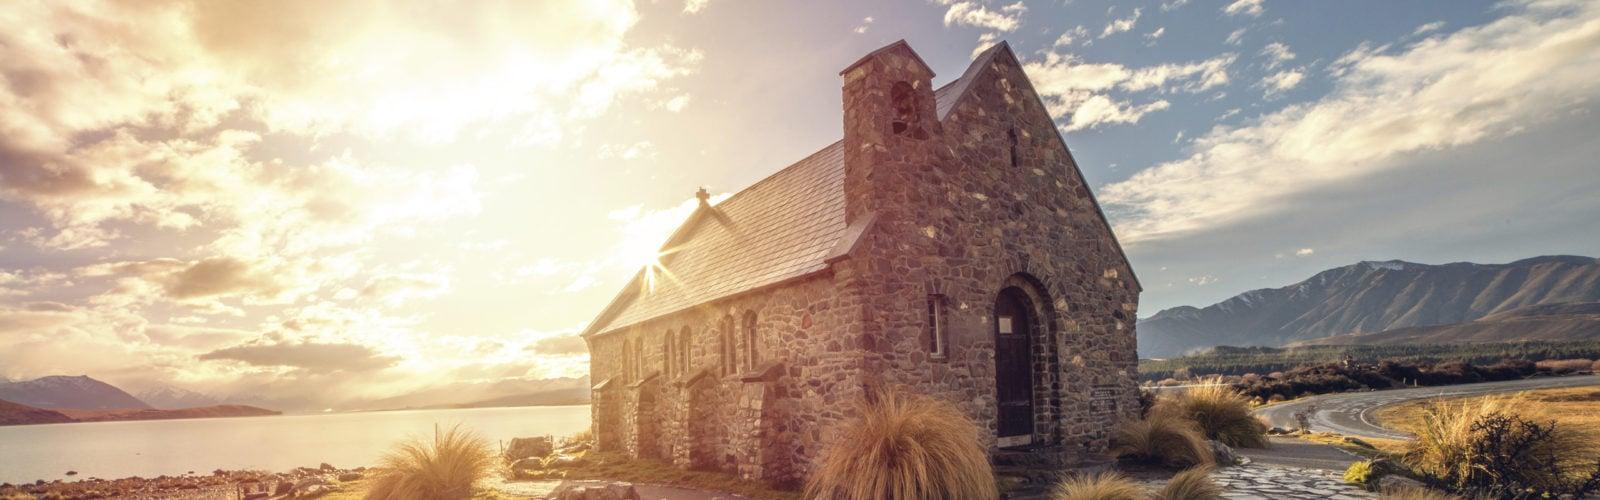 church-of-the-good-shepherd-lake-tekapo